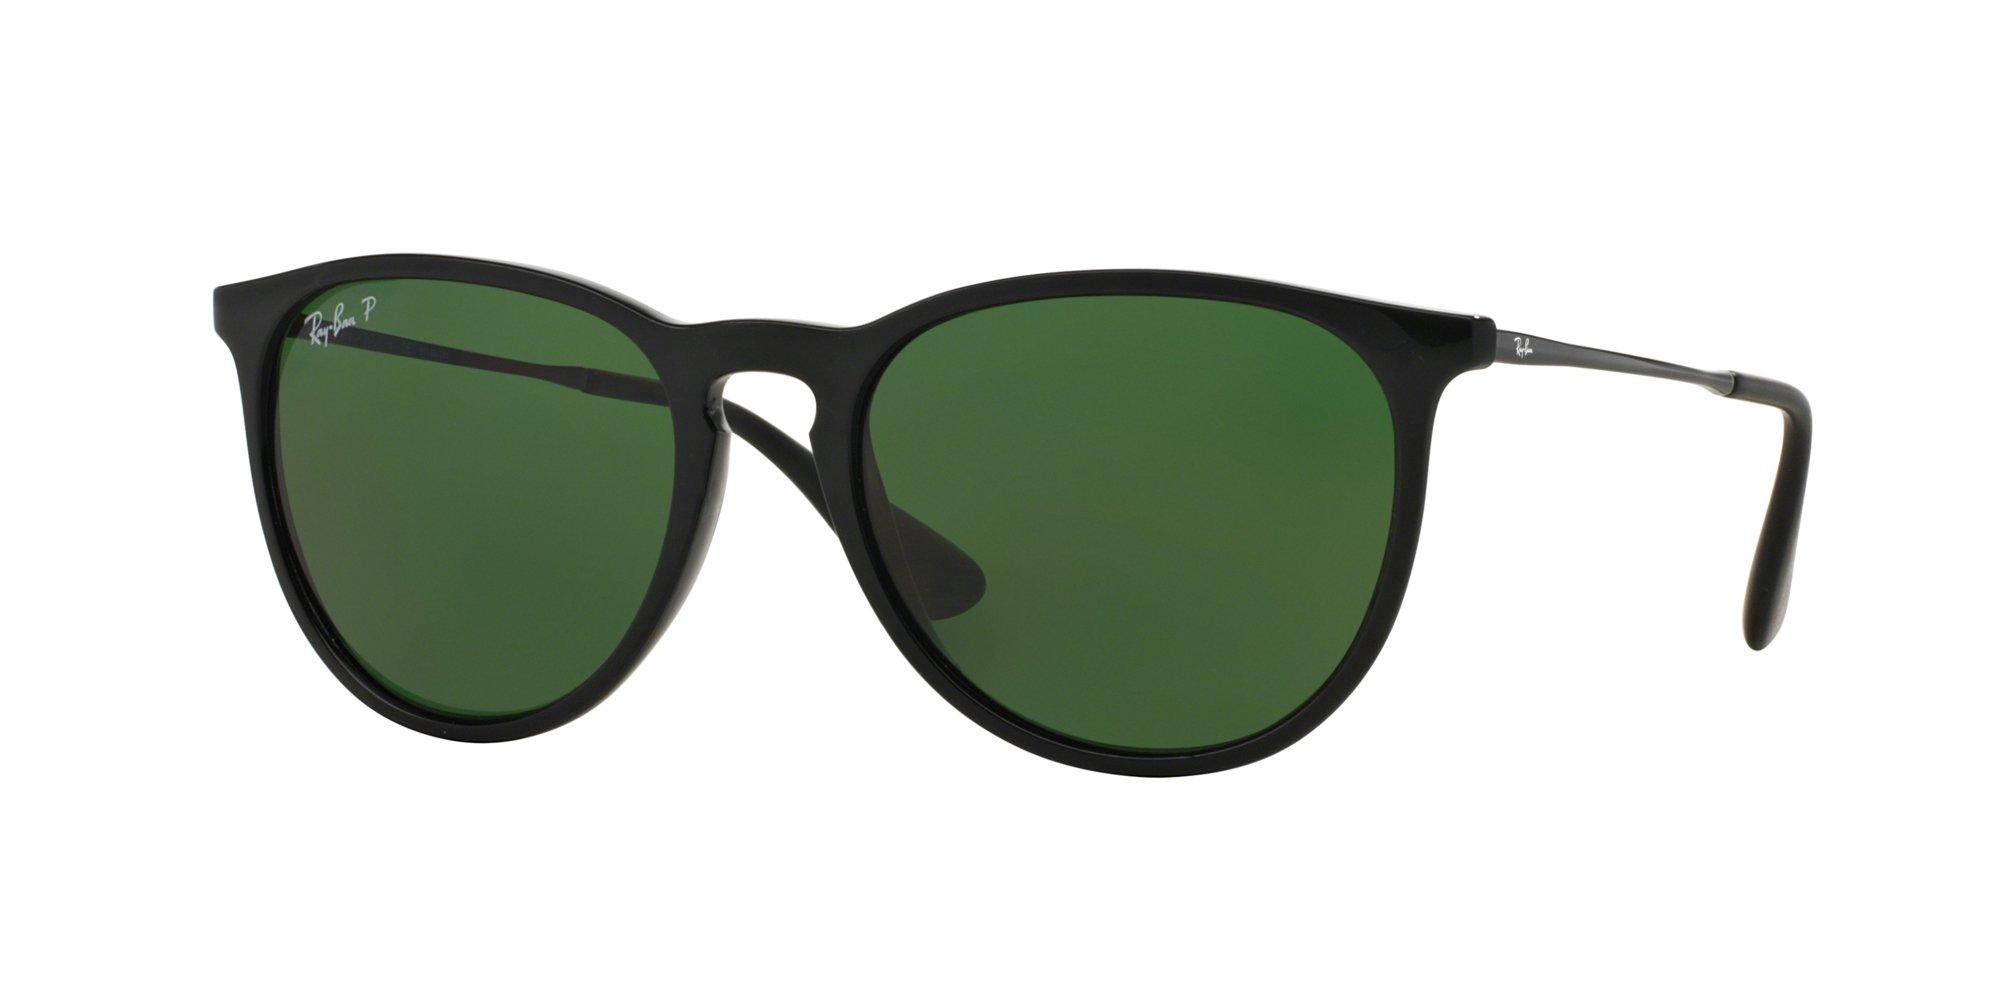 Ray Ban RB4171 601/2P 54M Black/Polarized Green+FREE Complimentary Eyewear Care Kit